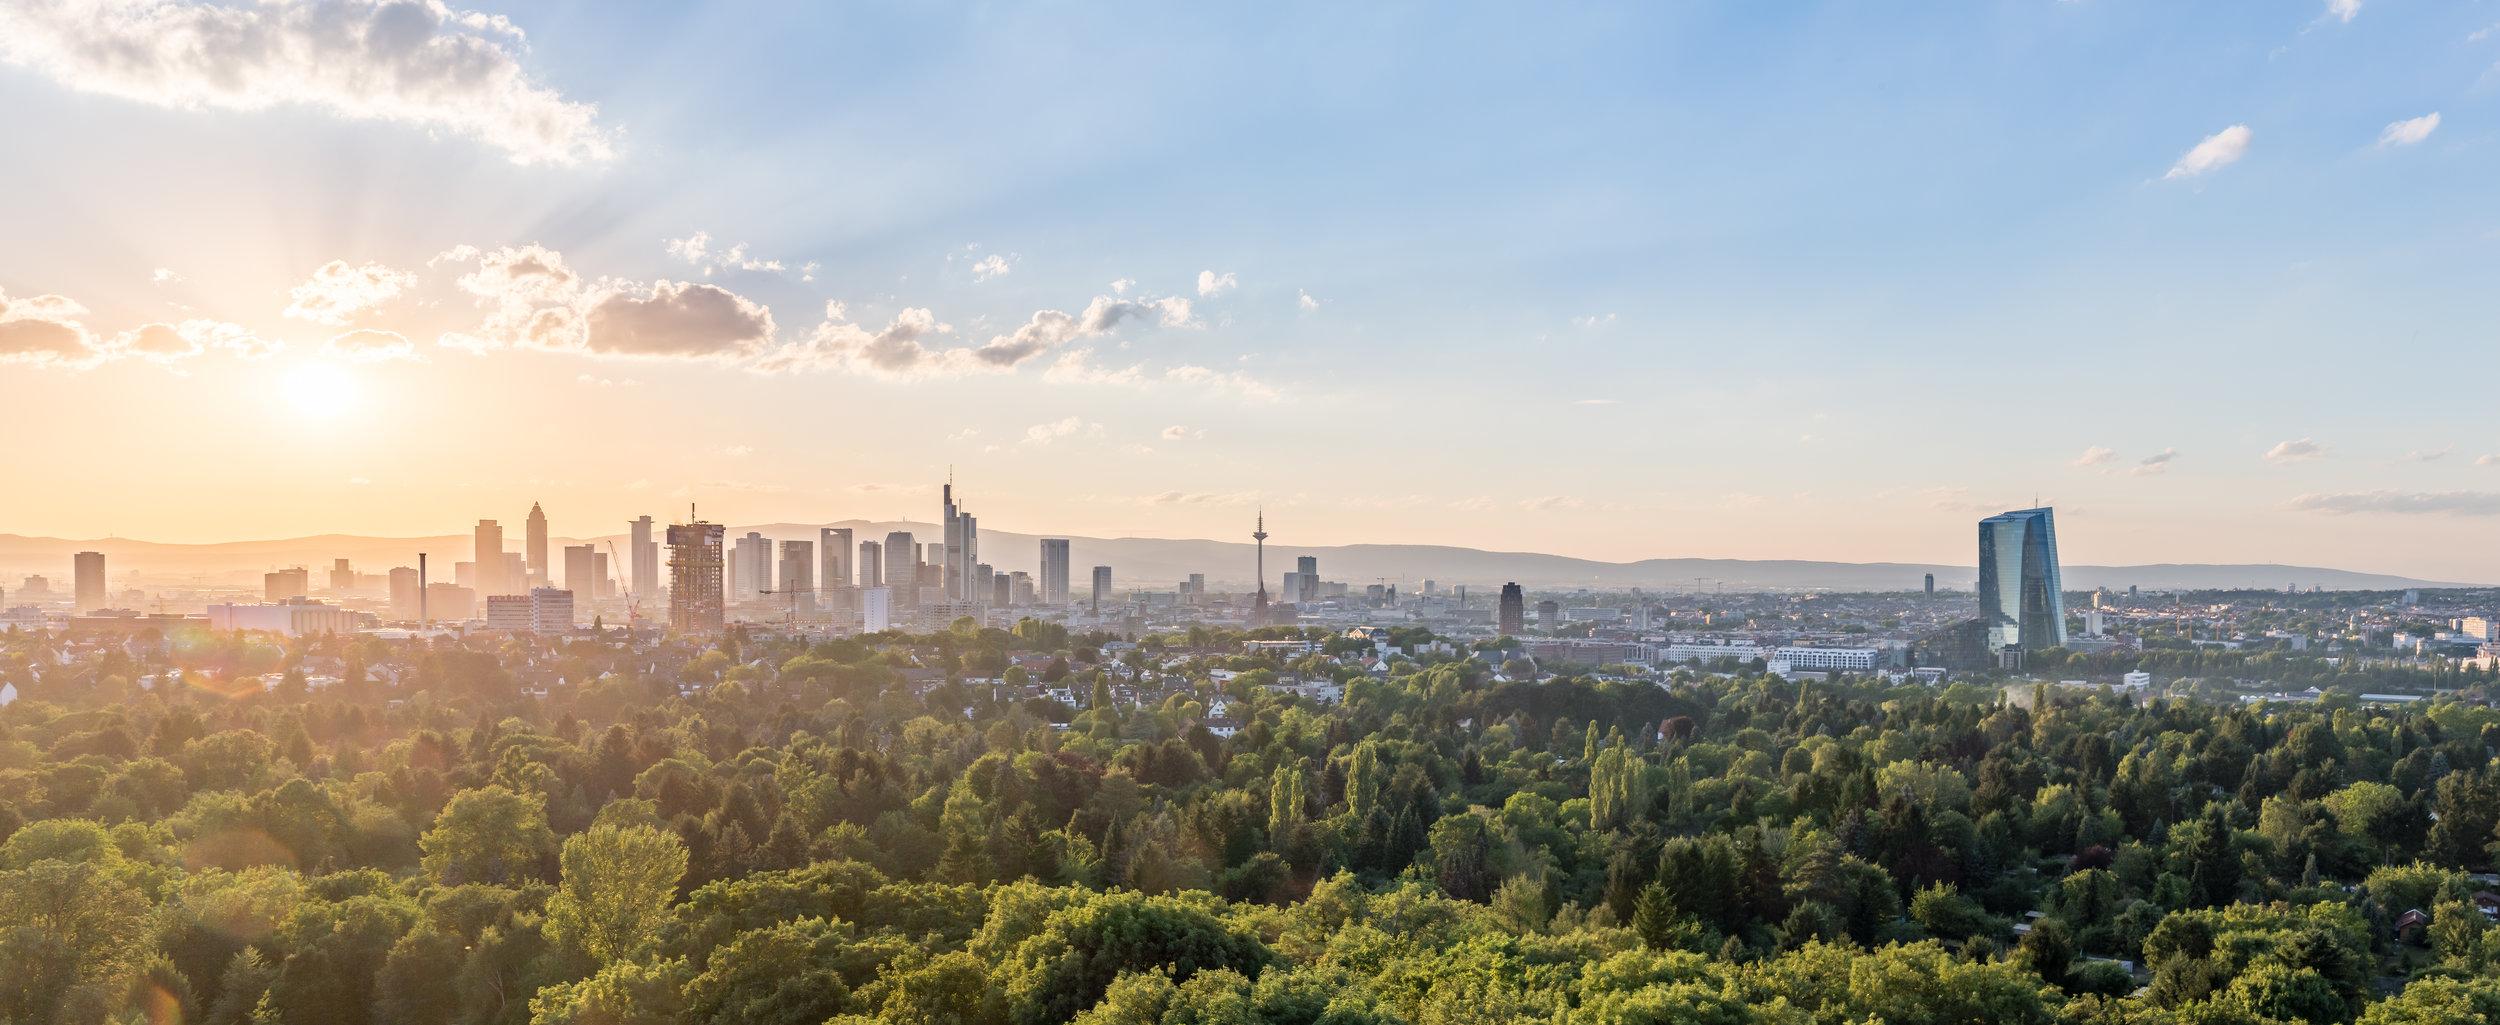 Digital Tigers - Digital Marketing Services for Germany